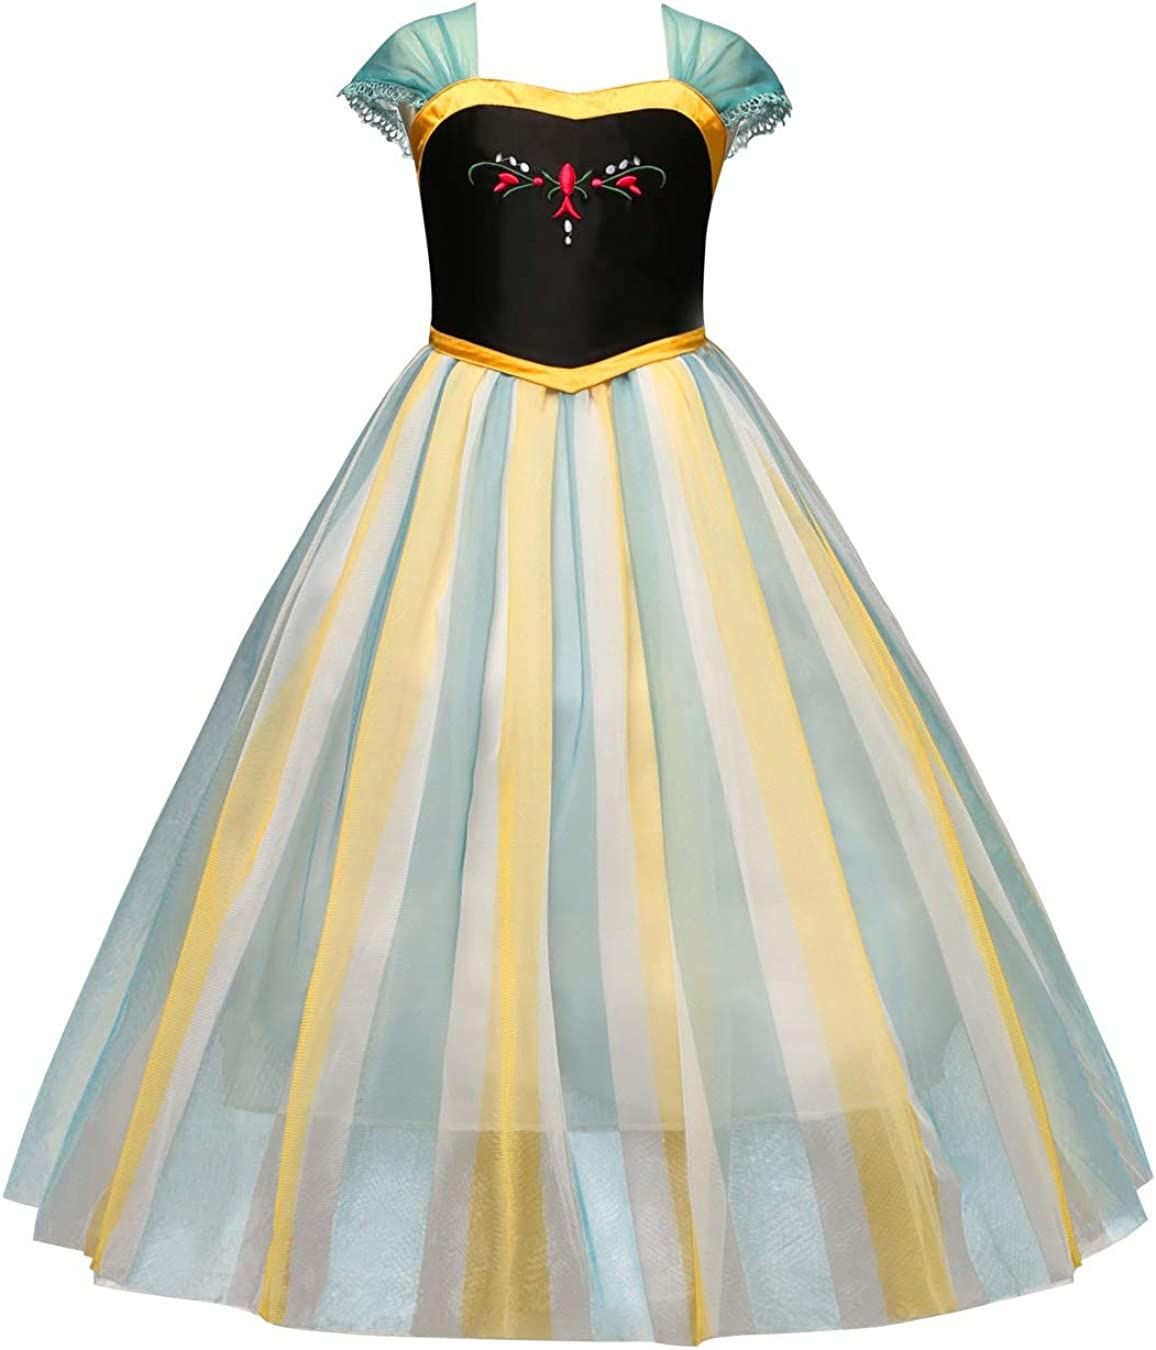 Daily Proposal DP3 Elsa Story Girl Kids Dress Halloween Costume 4-10 USA